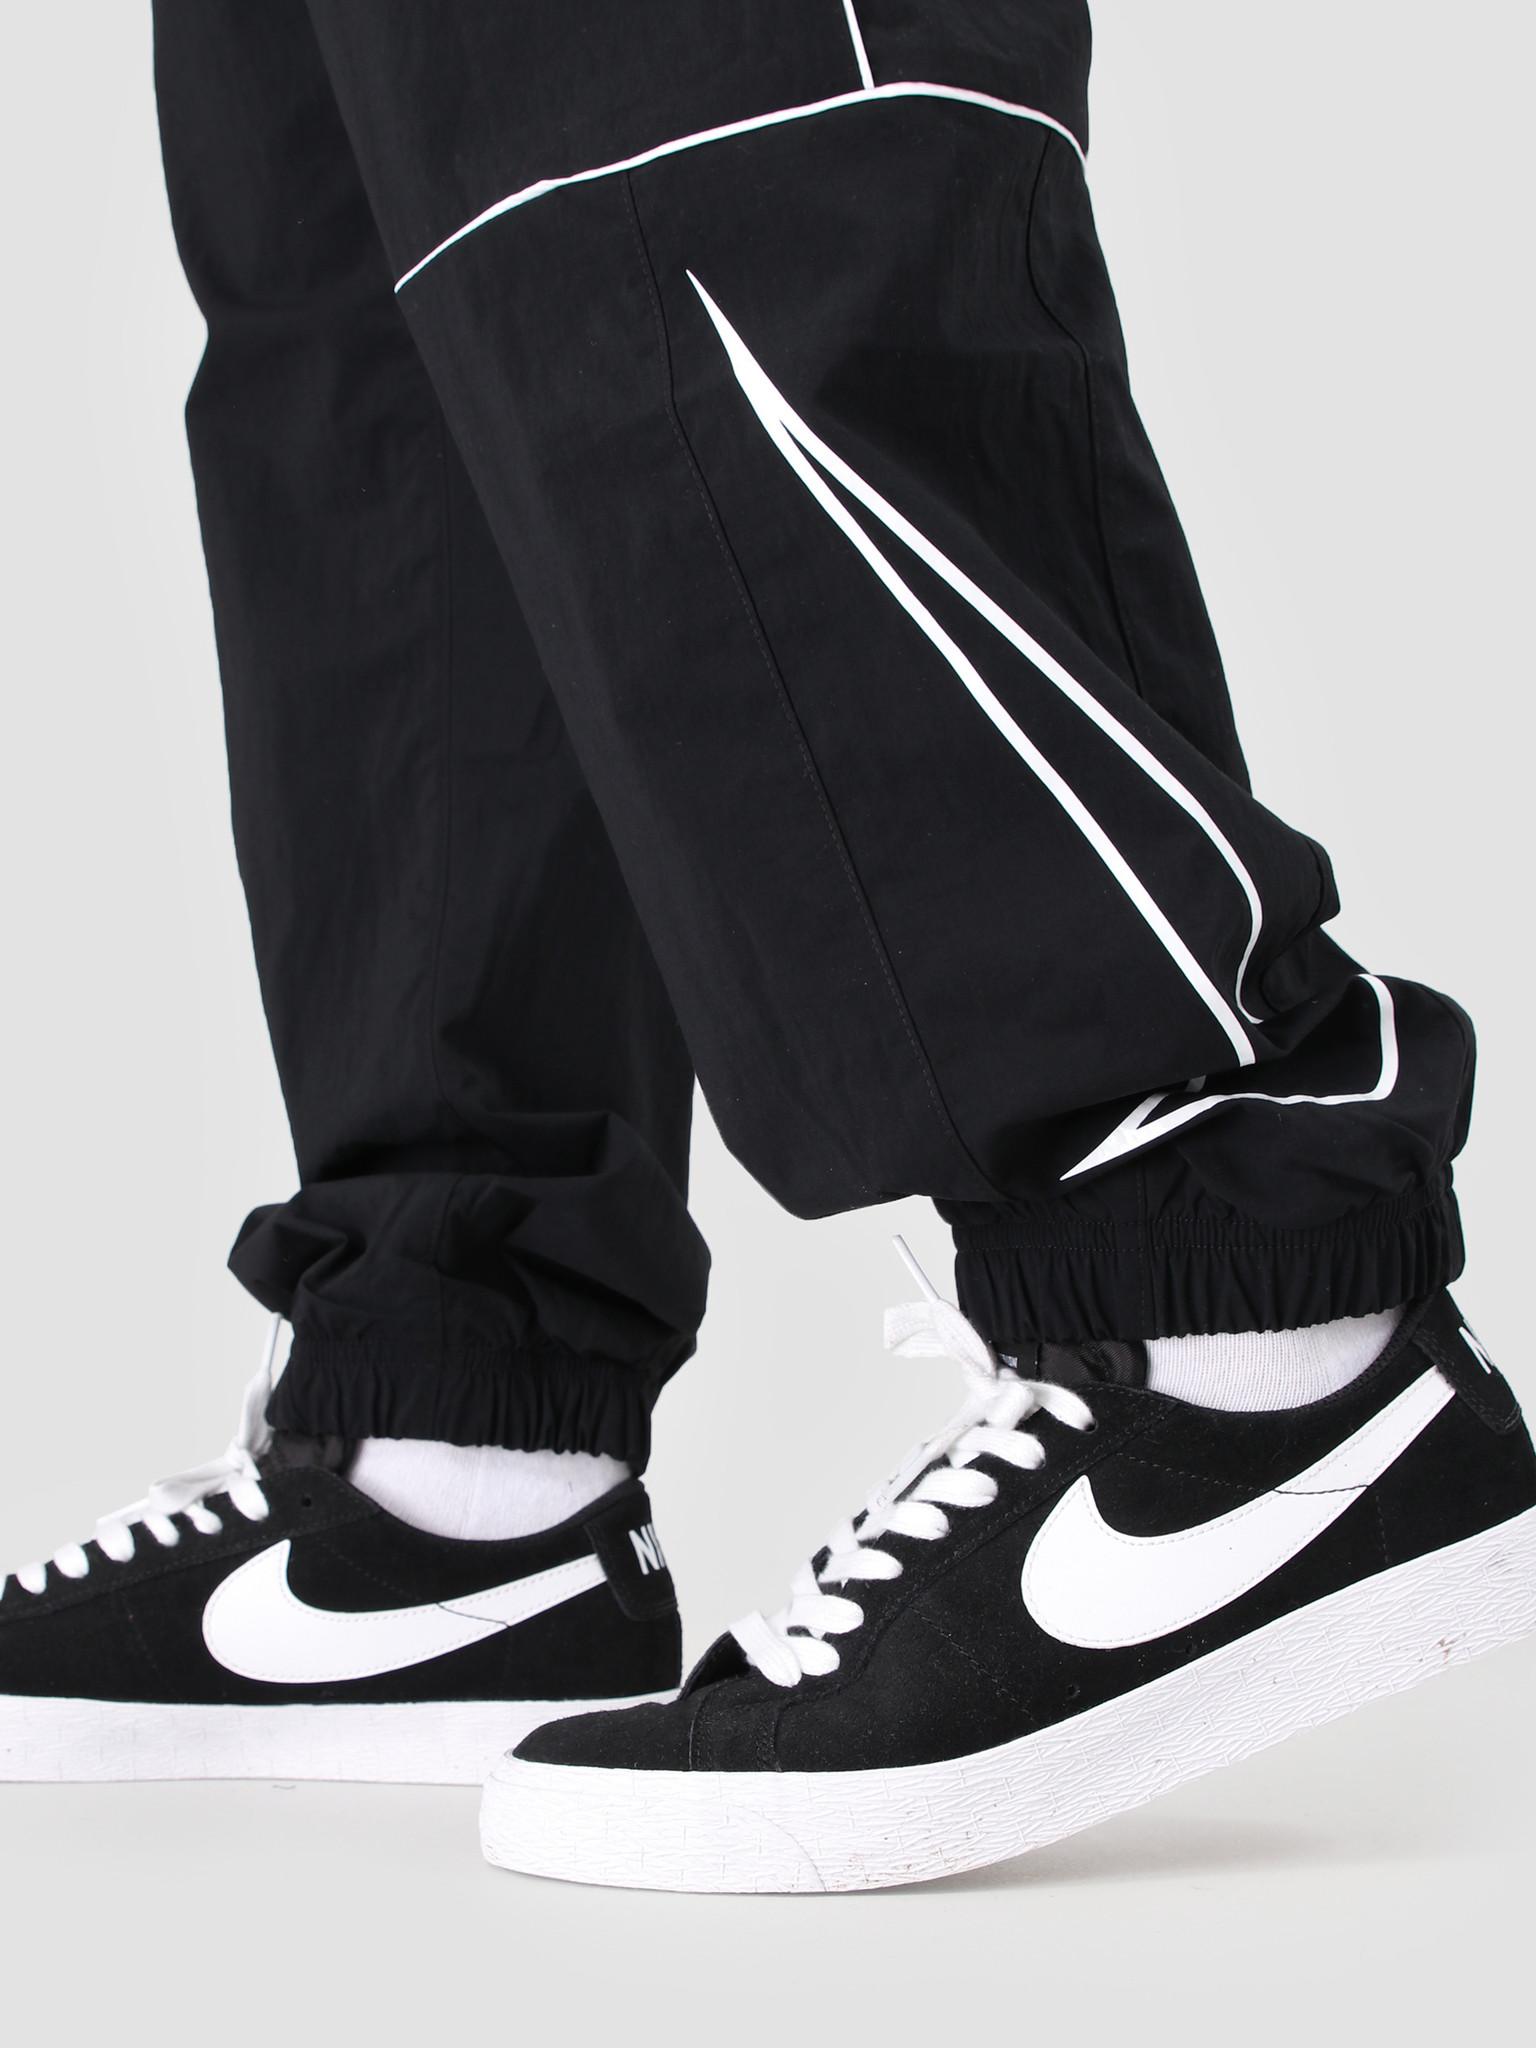 Nike Nike SB Pant Black White White Aj9774-010